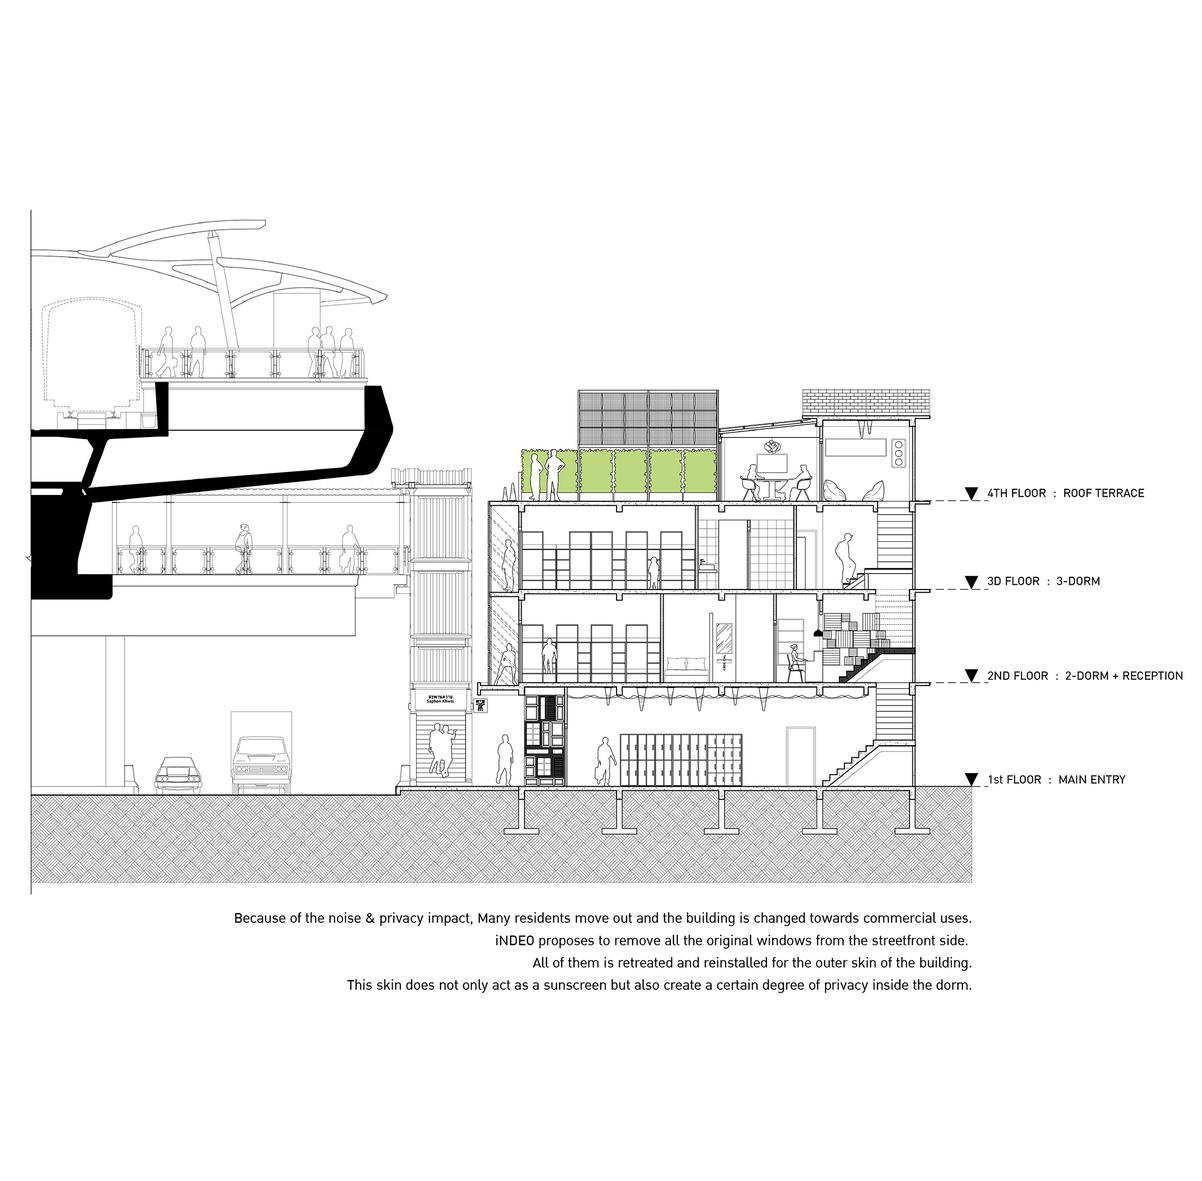 ADVENTURE HOSTEL image via:http://www.archdaily.com/780124/adventure-hostel-integrated-design-office